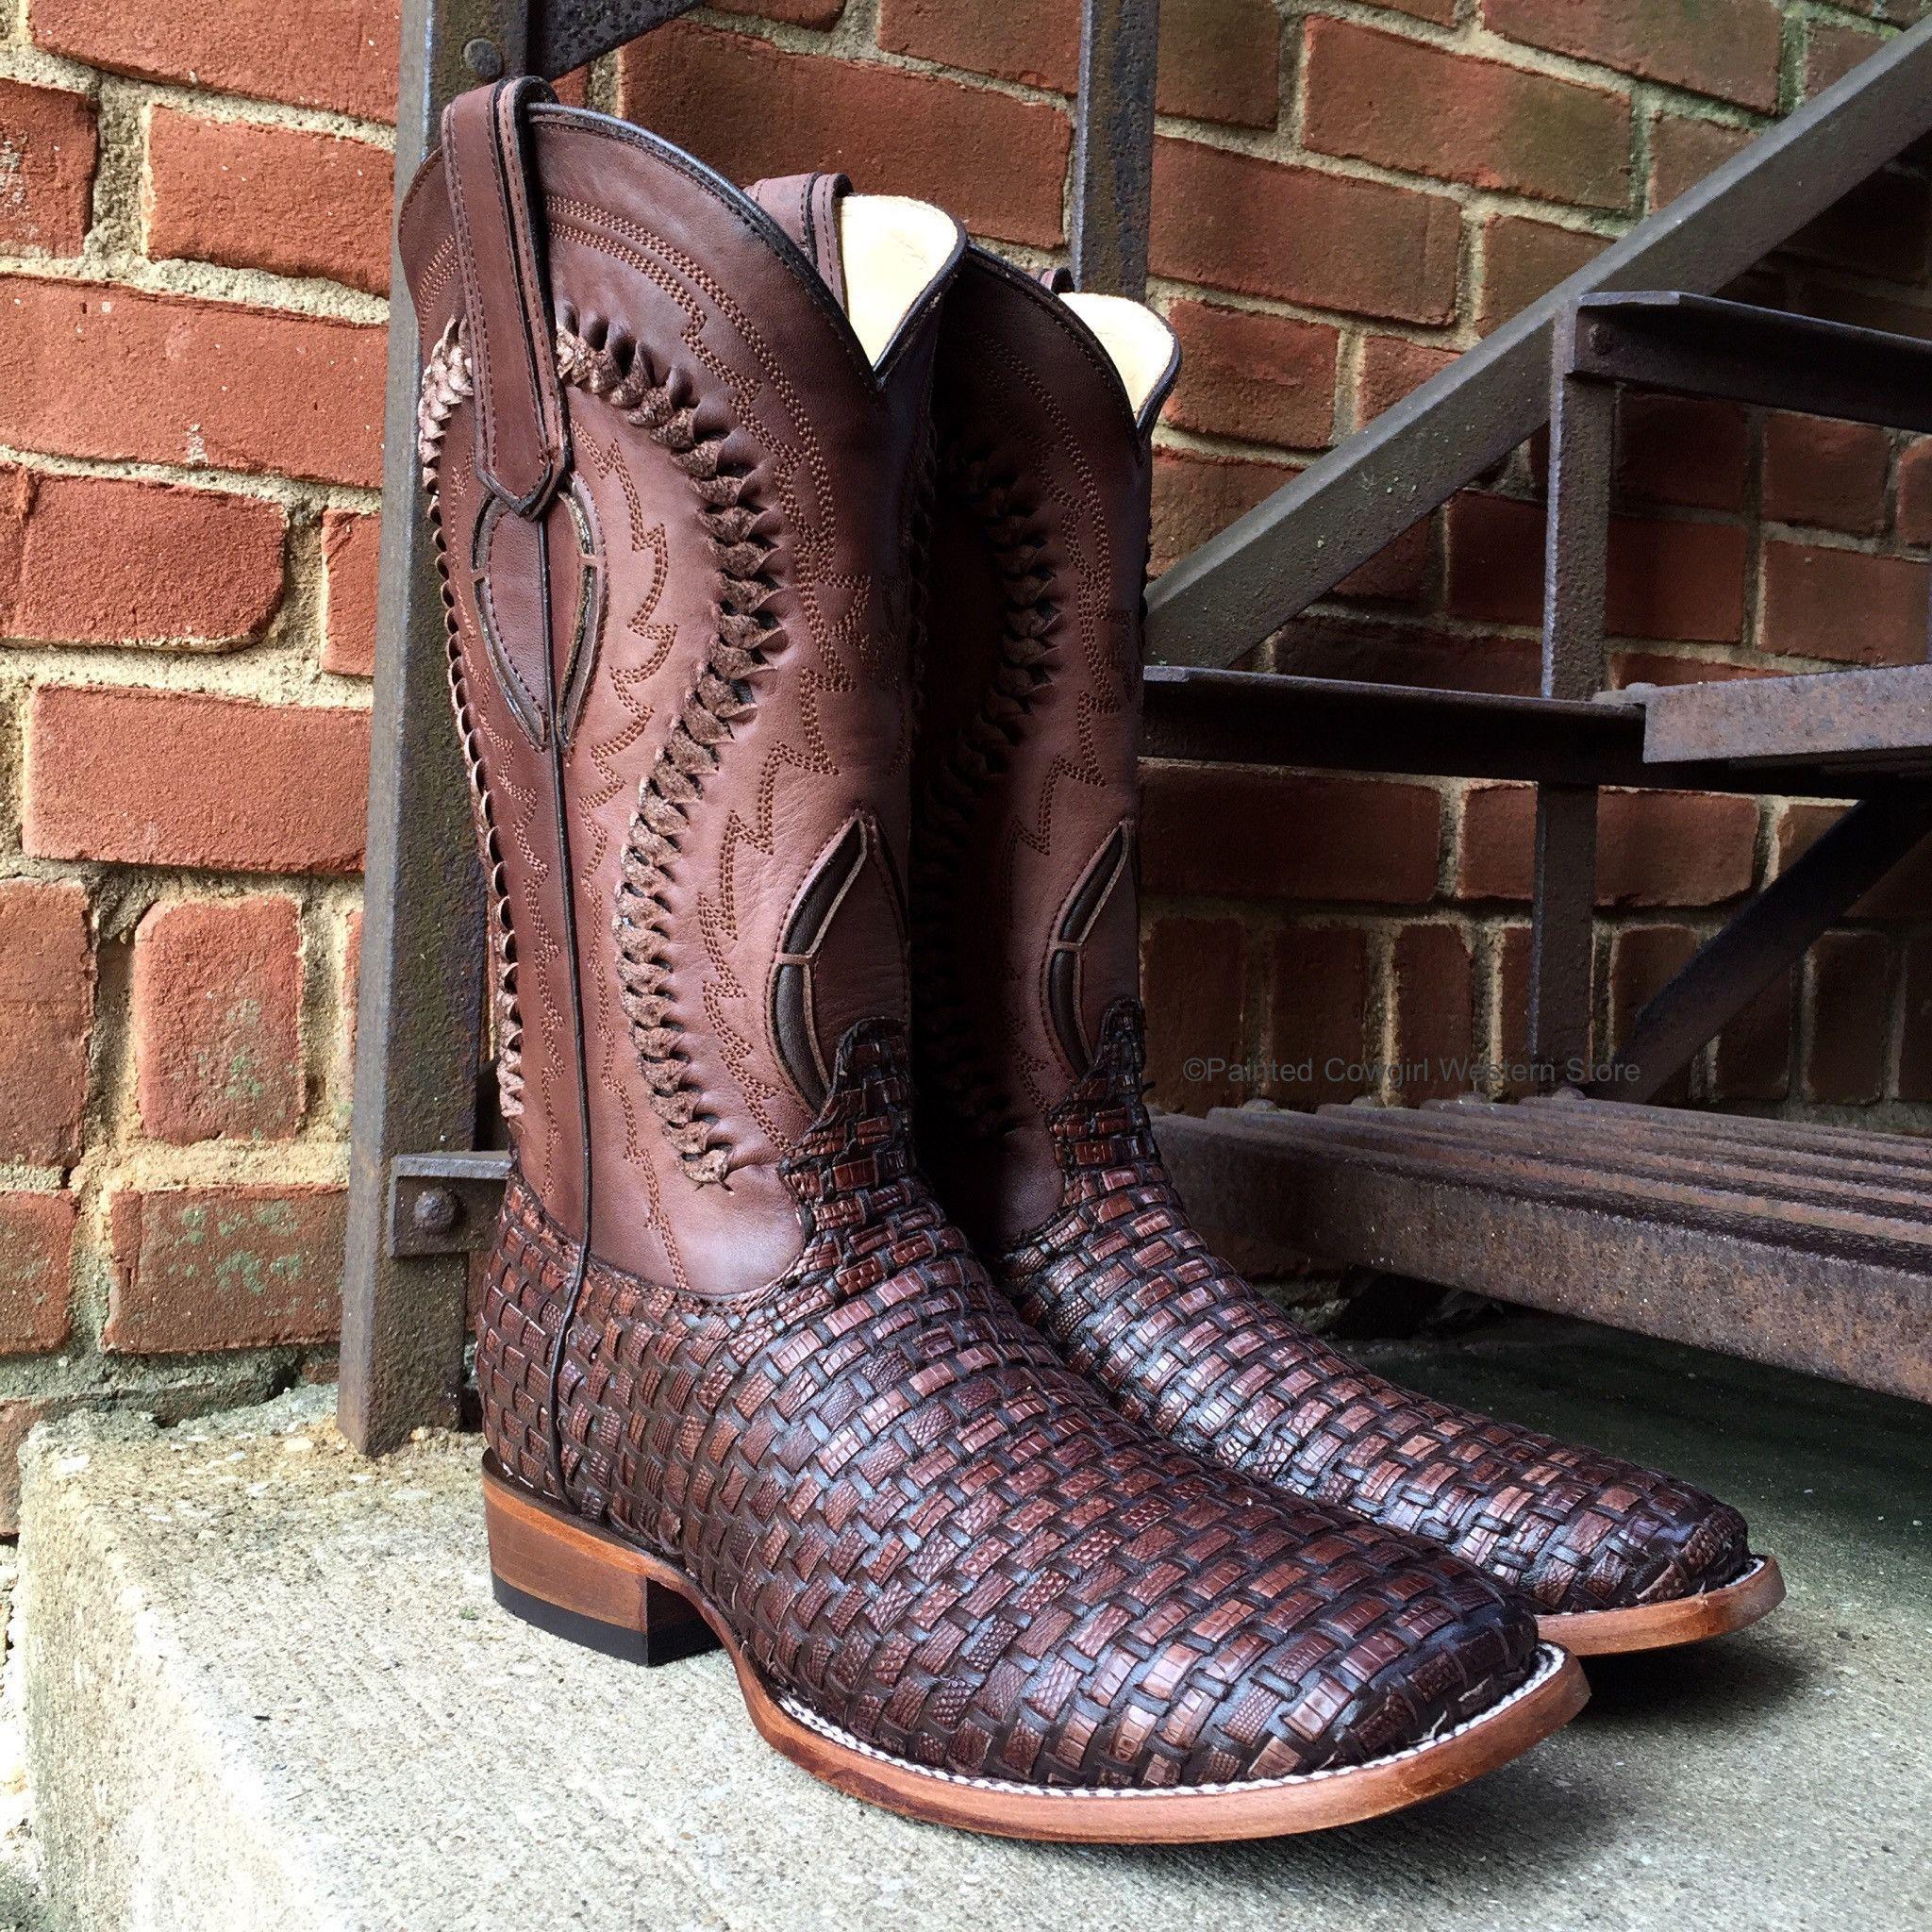 6863dd85337 Corral Men's Exotic Braided Lizard Print Brown Square Toe Boot C3087 ...